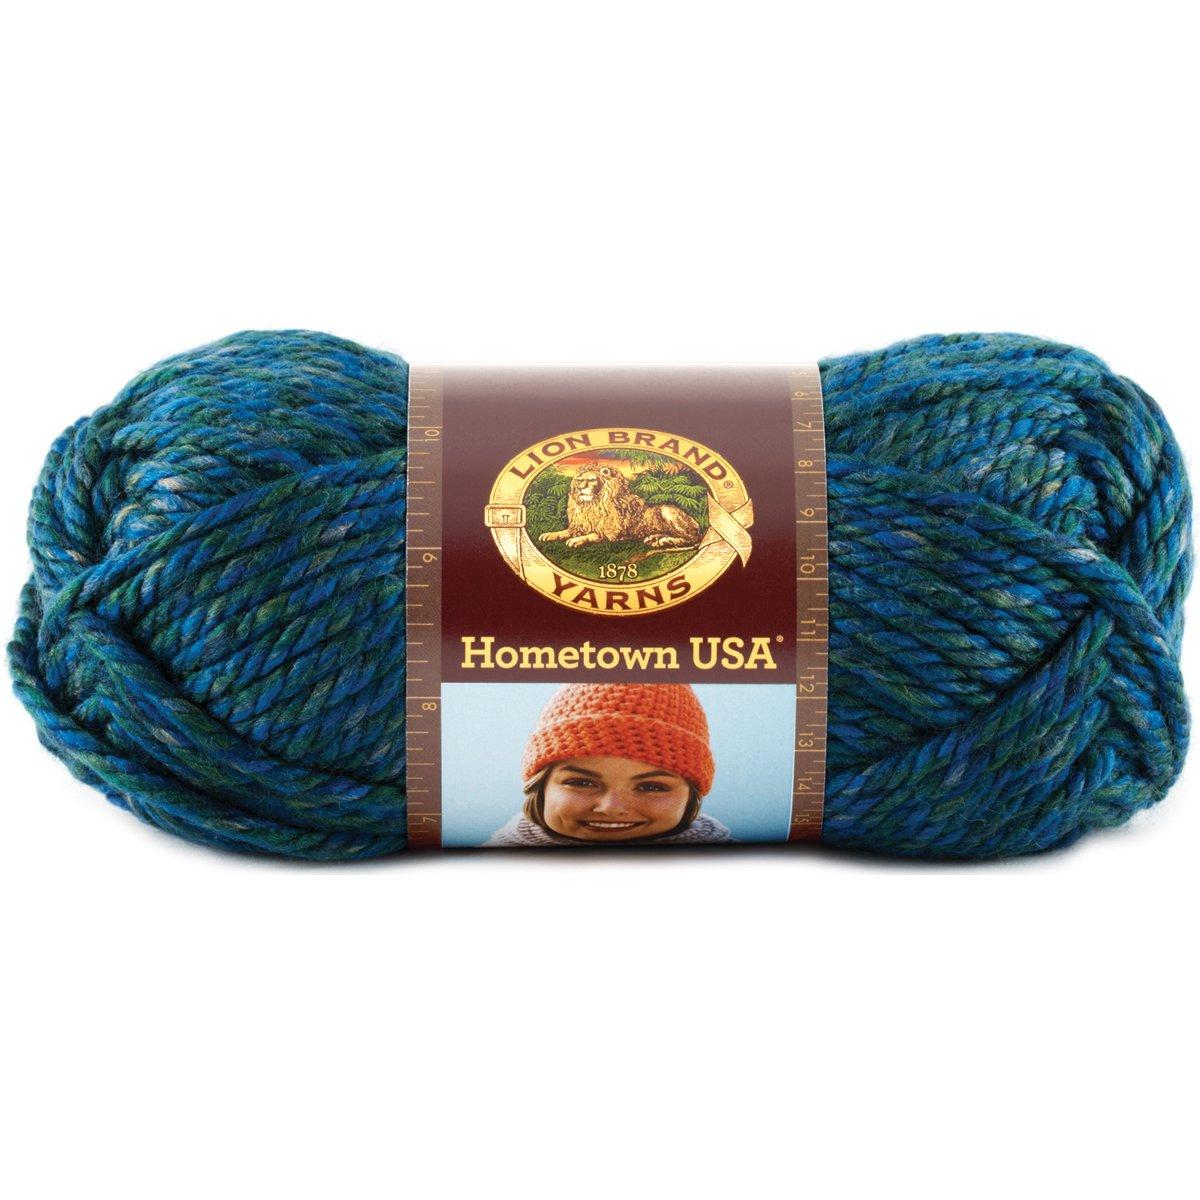 149 Dallas Grey Lion Brand Yarn Lion Brand Hometown USA Yarn